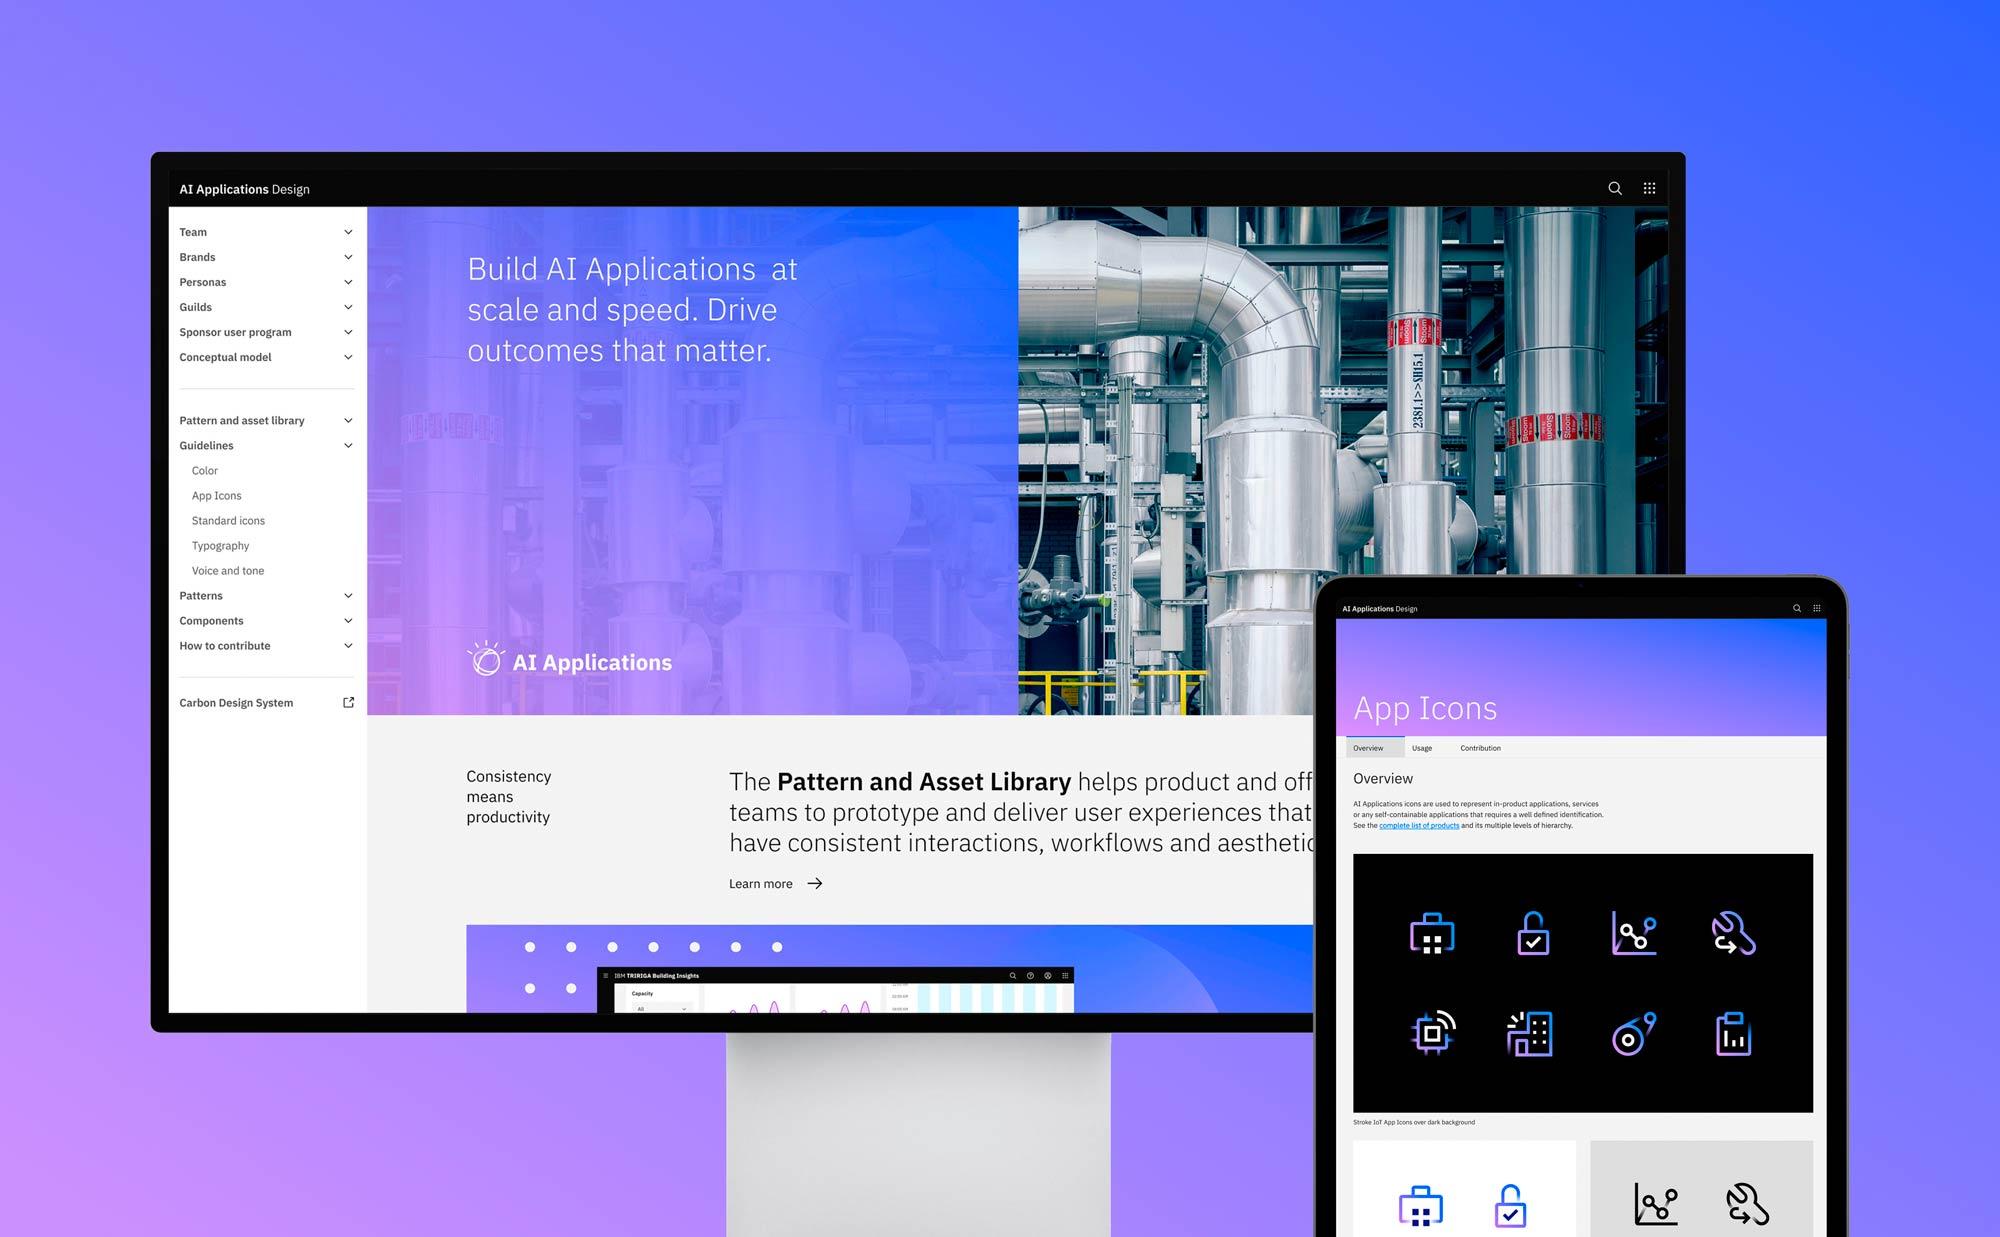 ai-apps-cover-thumbnail-2k